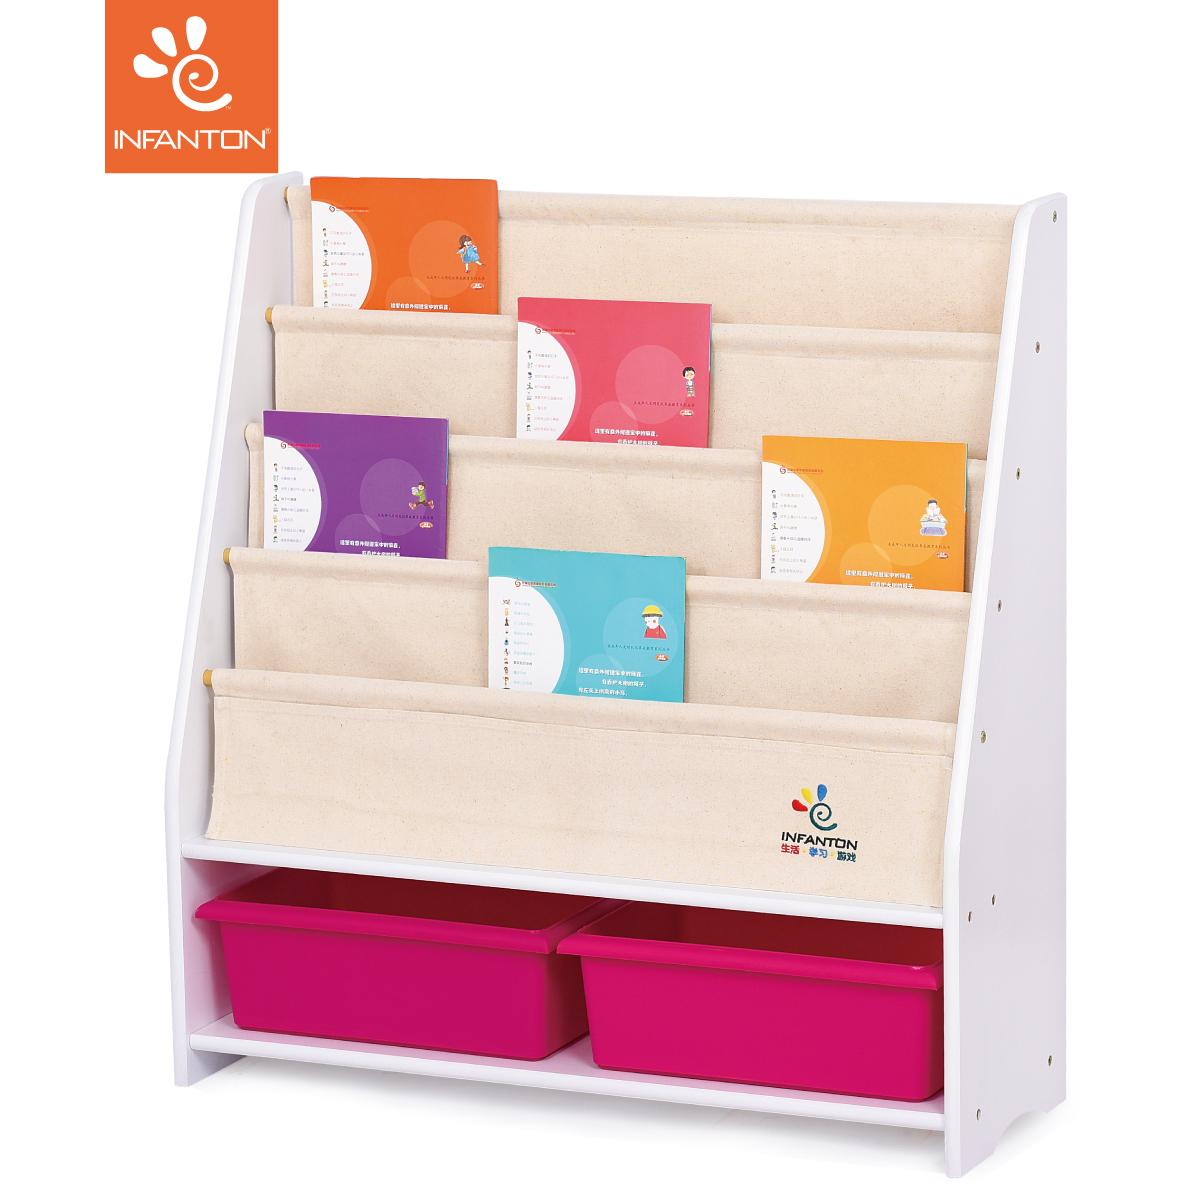 Infanton White Baby Bookshelf Childrens Solid Wood Kindergarten Book Holder Painted